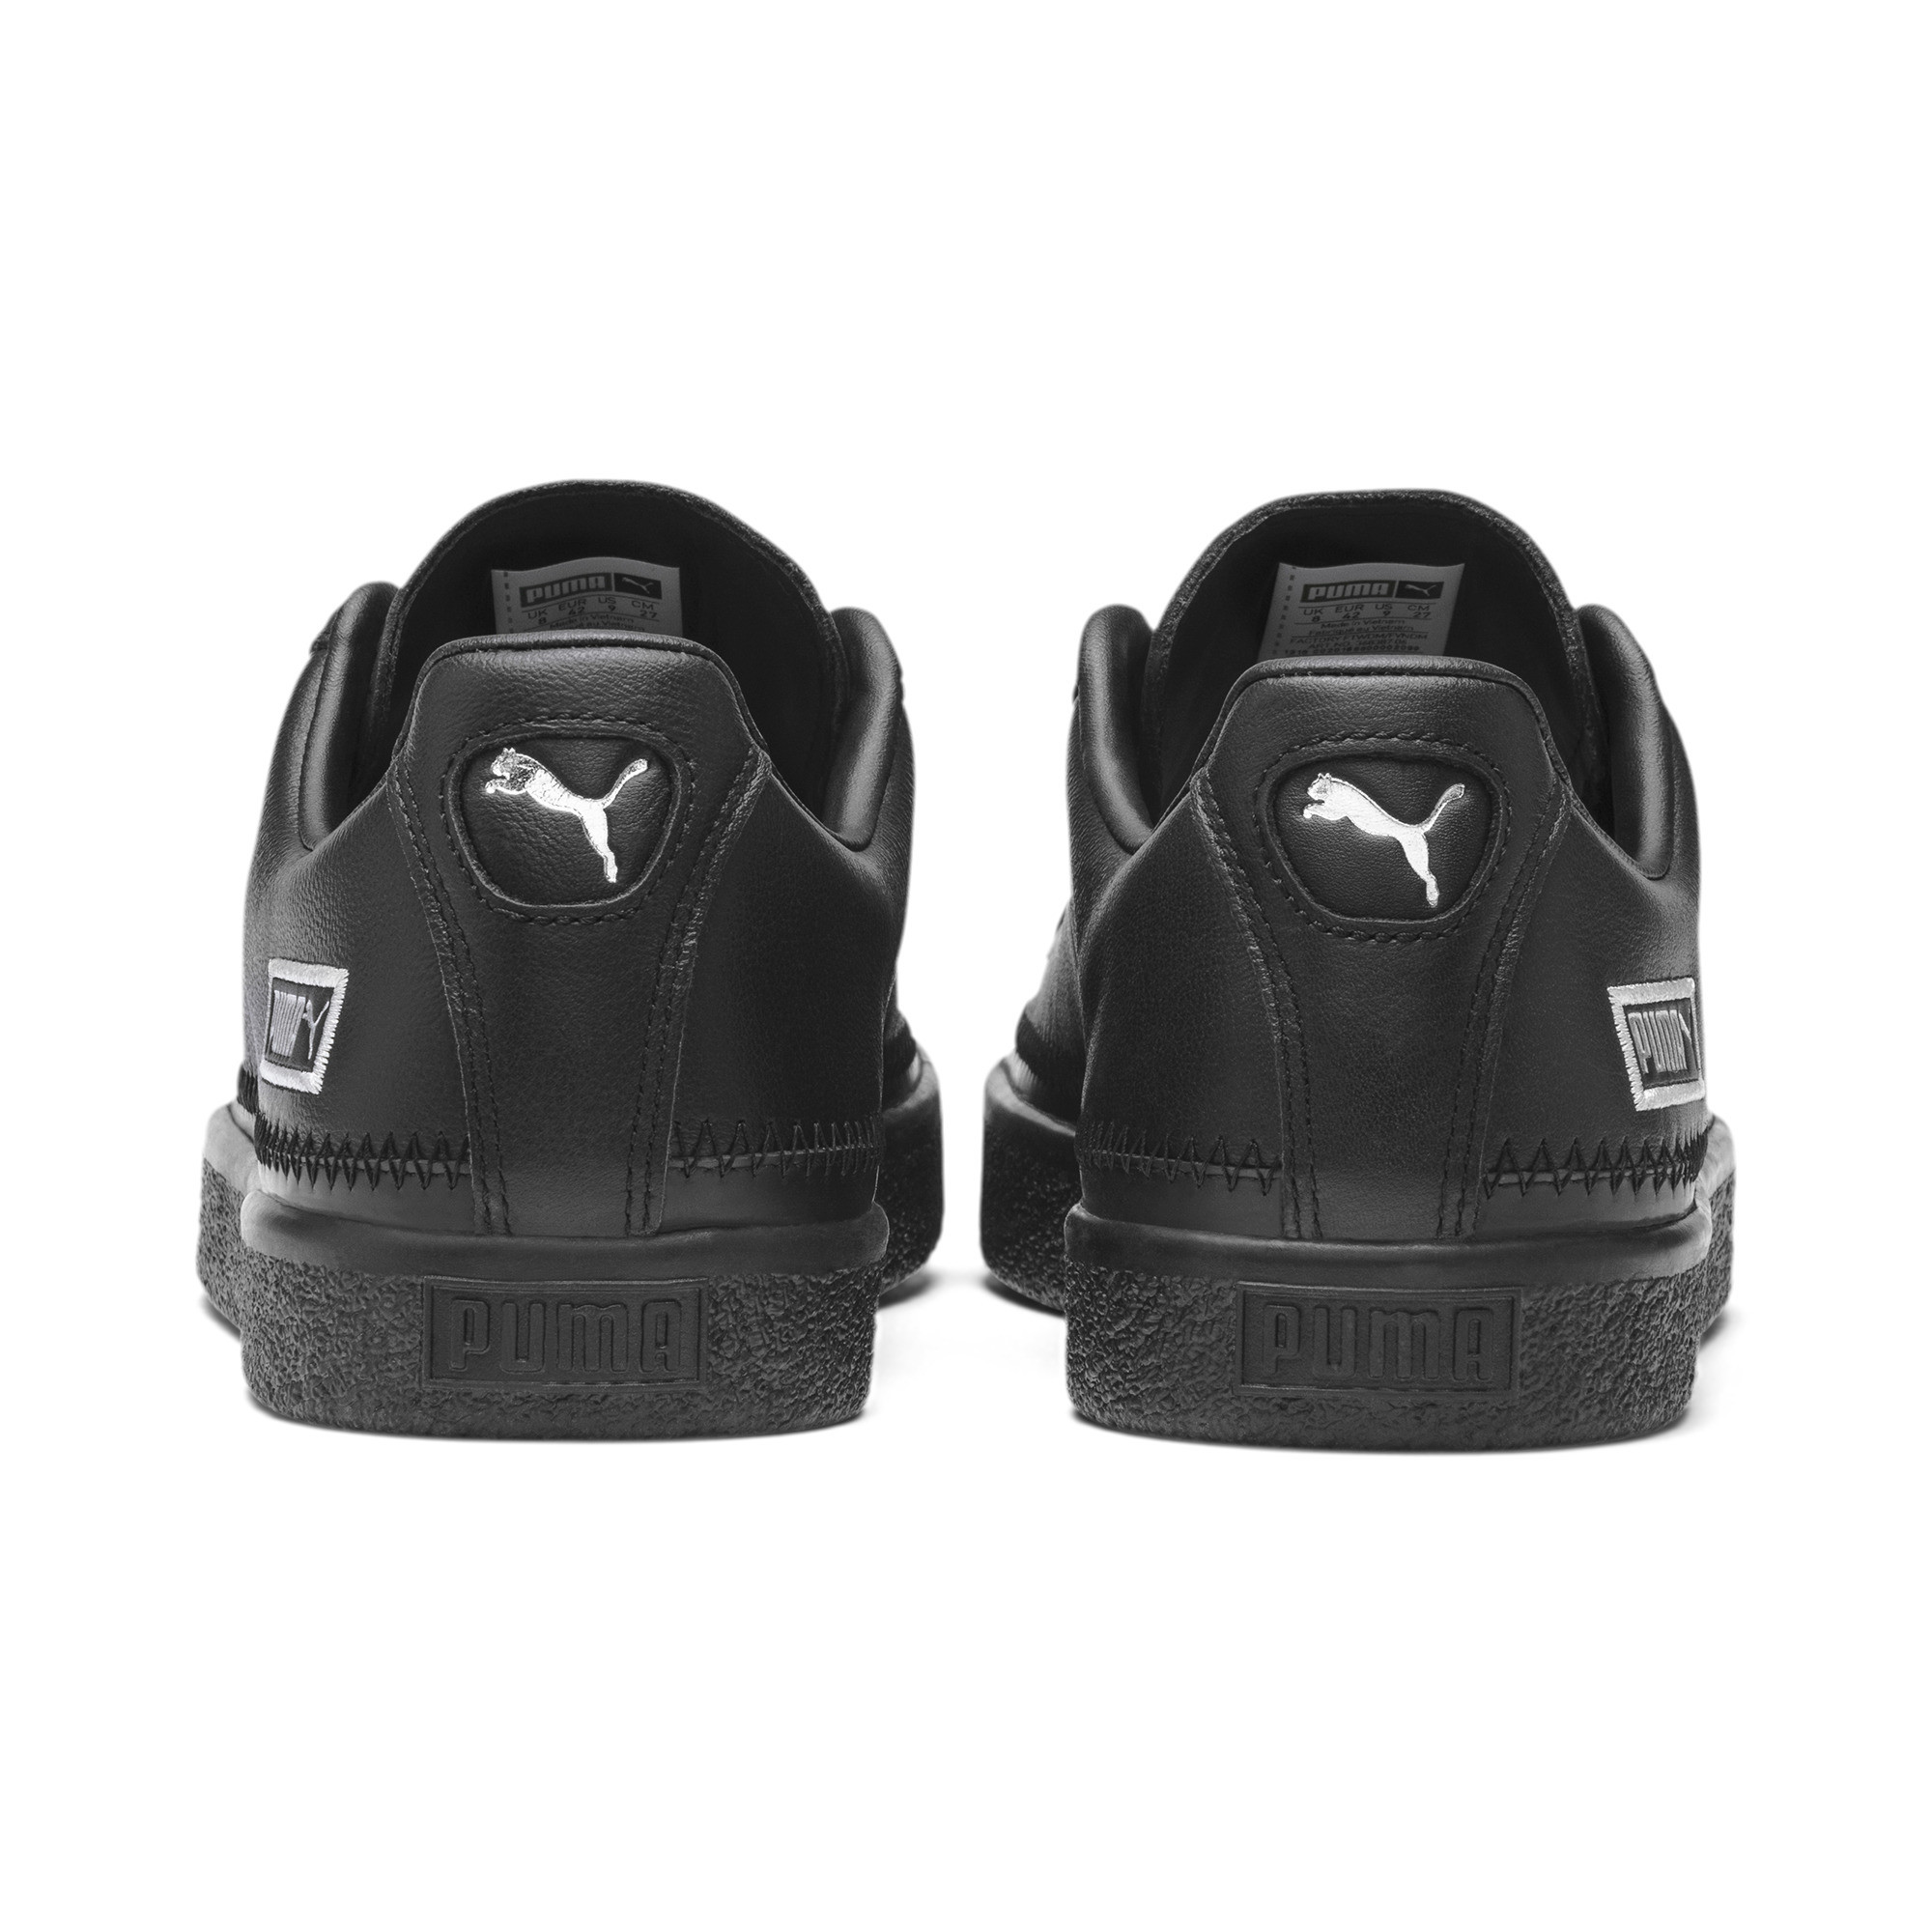 PUMA-Basket-Stitch-Sneaker-Unisex-Schuhe-Neu Indexbild 9